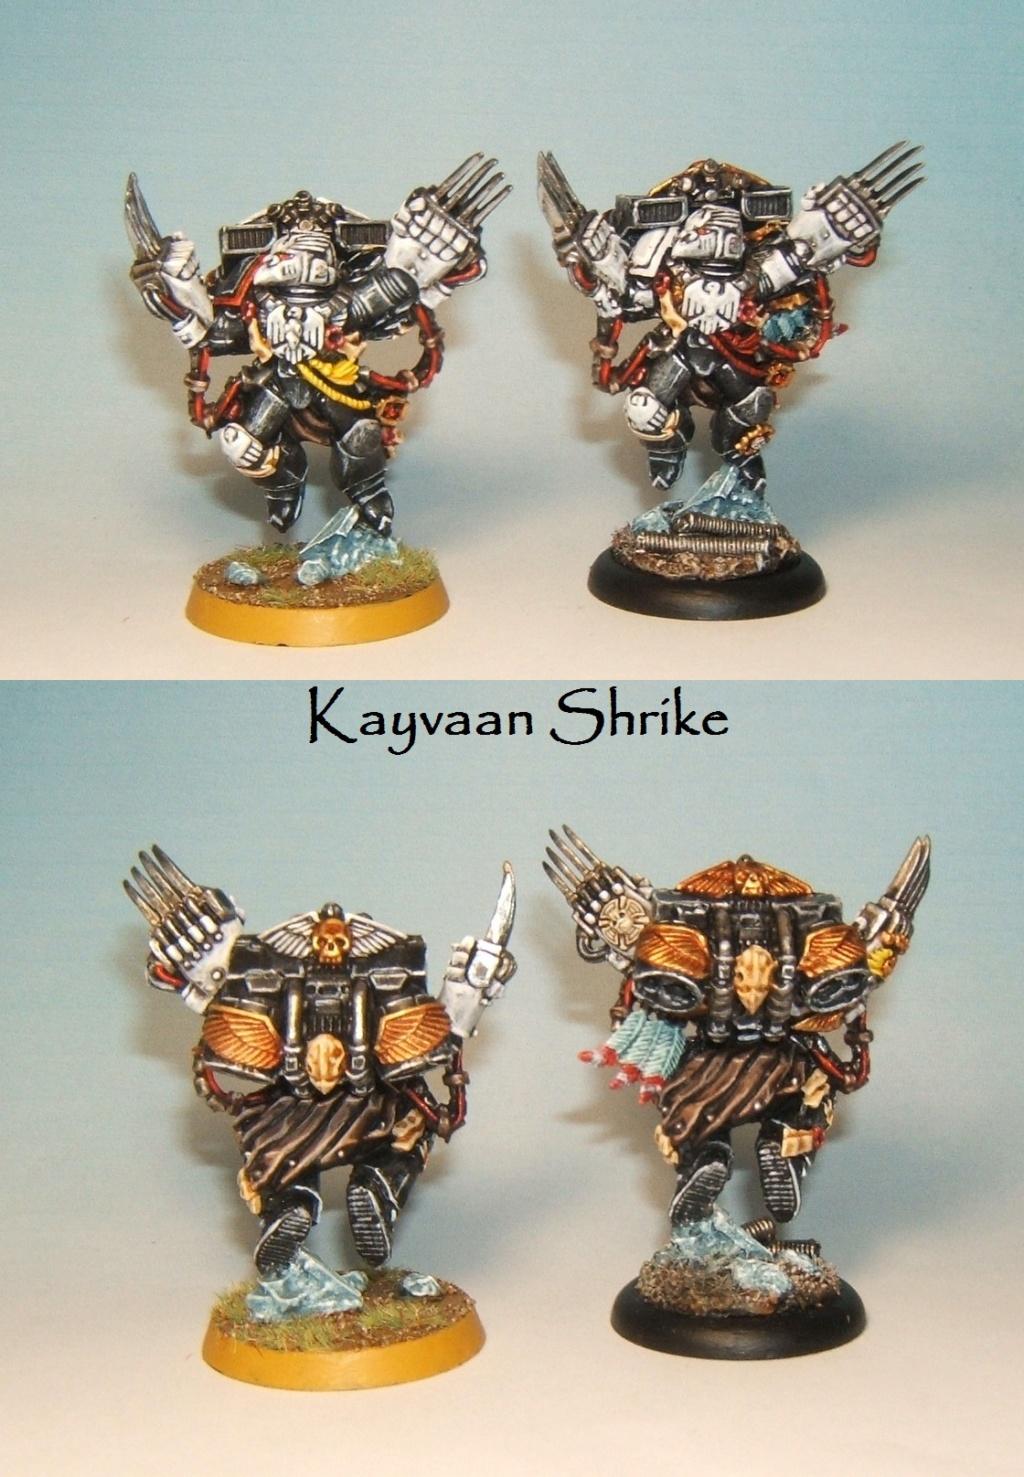 Warhammer et moi! - Page 3 Kayvaa10